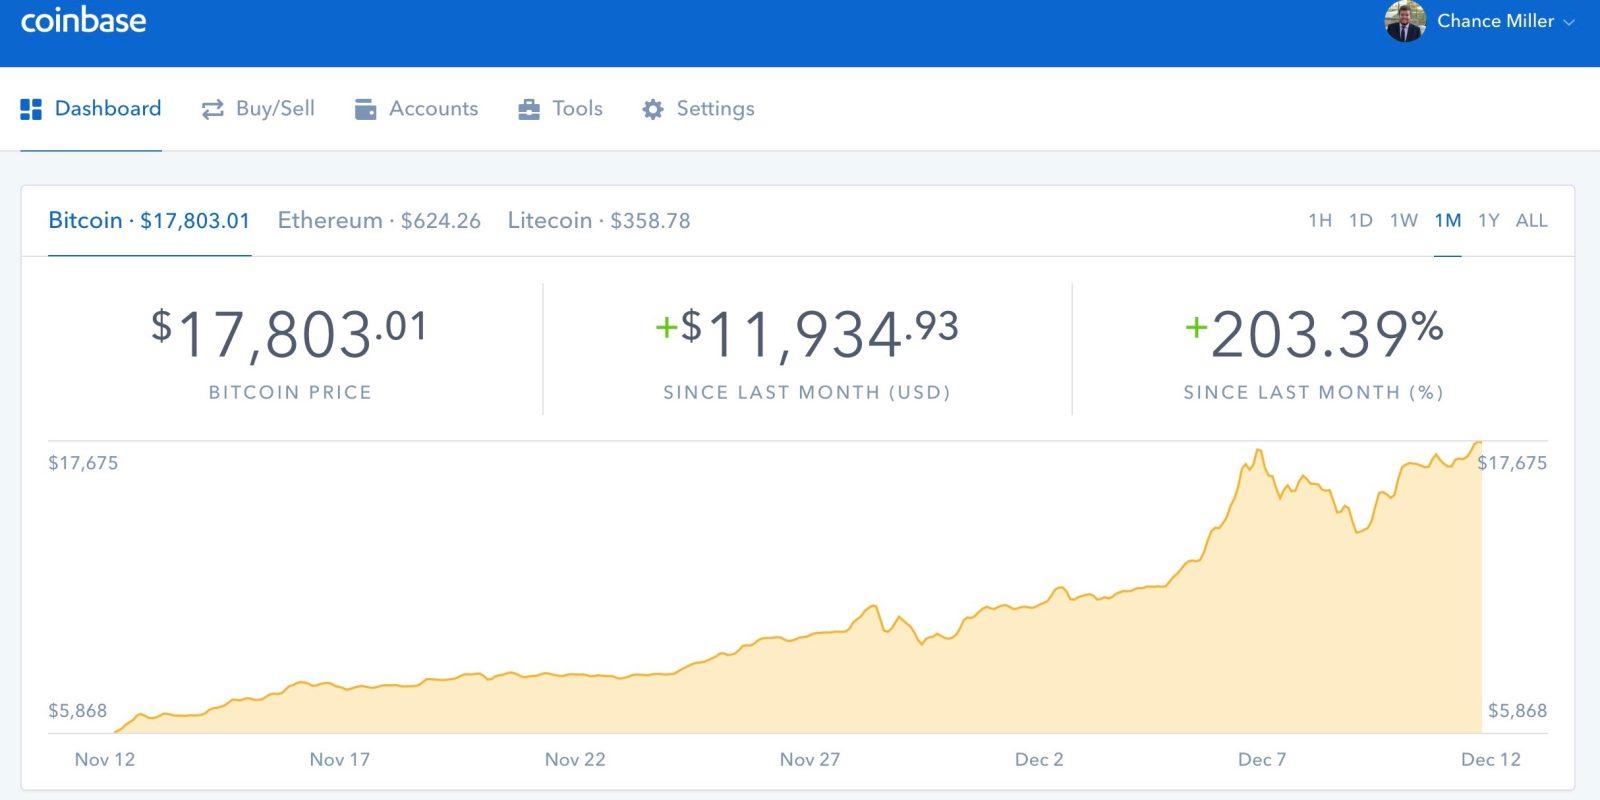 coinbase app screenshot